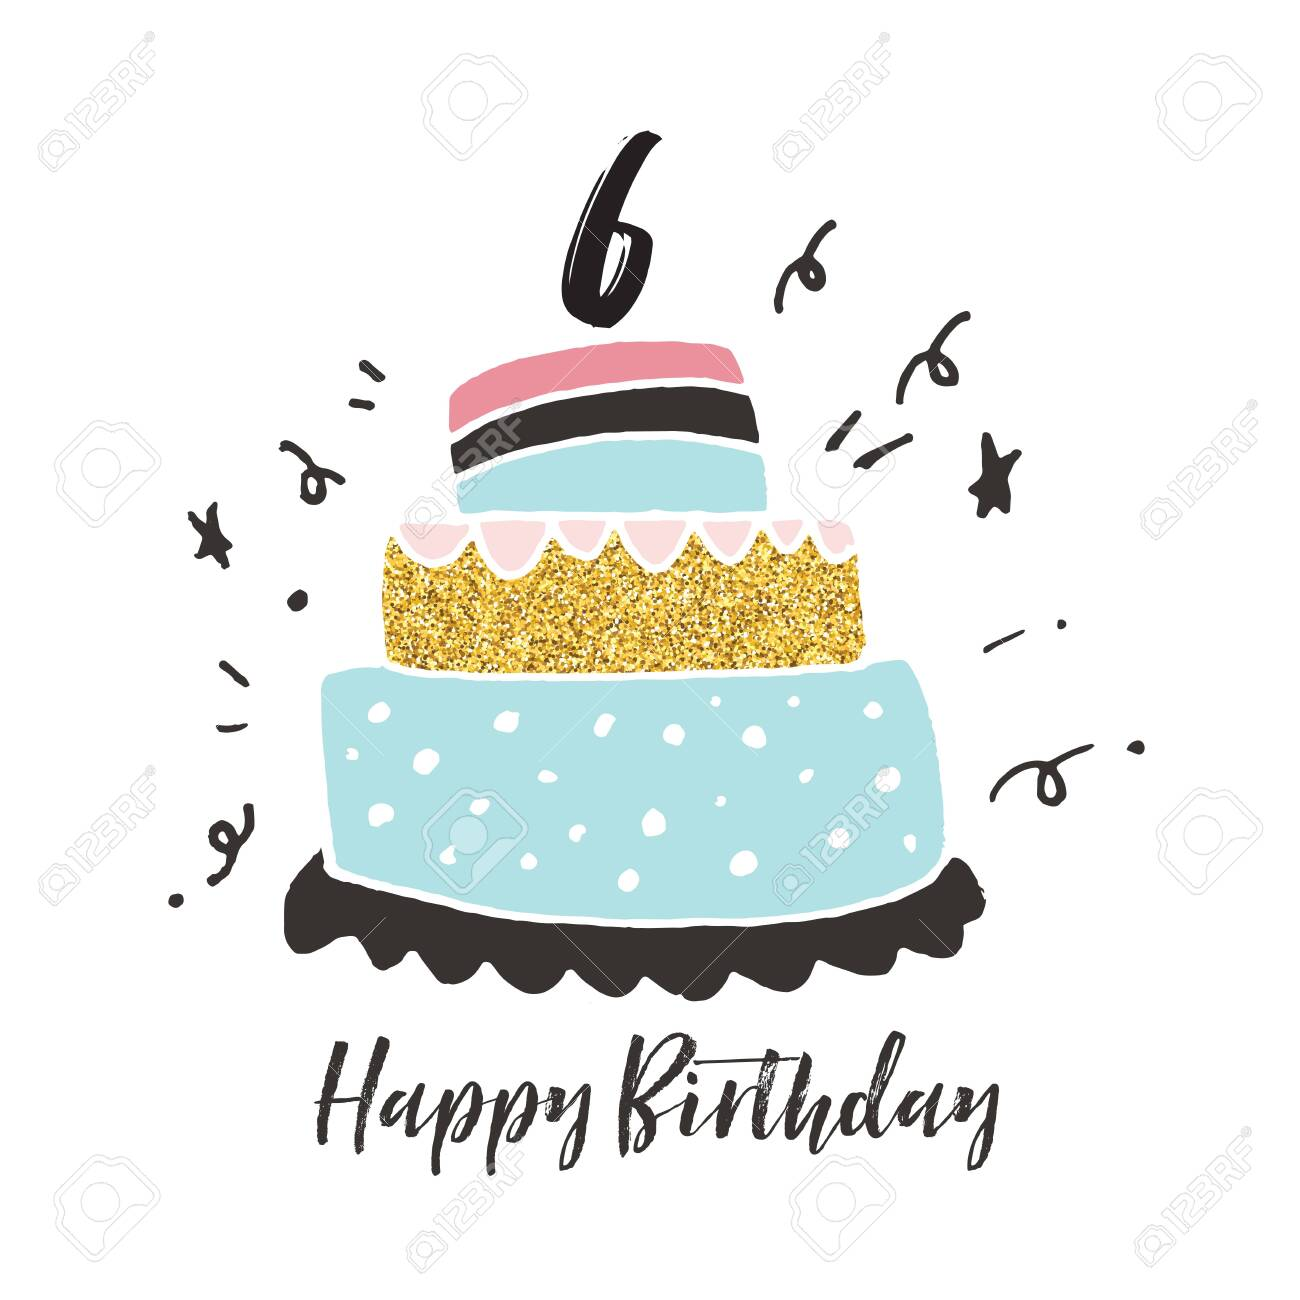 Enjoyable 6Th Birthday Hand Drawn Cake Birthday Card Stock Photo Picture Personalised Birthday Cards Veneteletsinfo